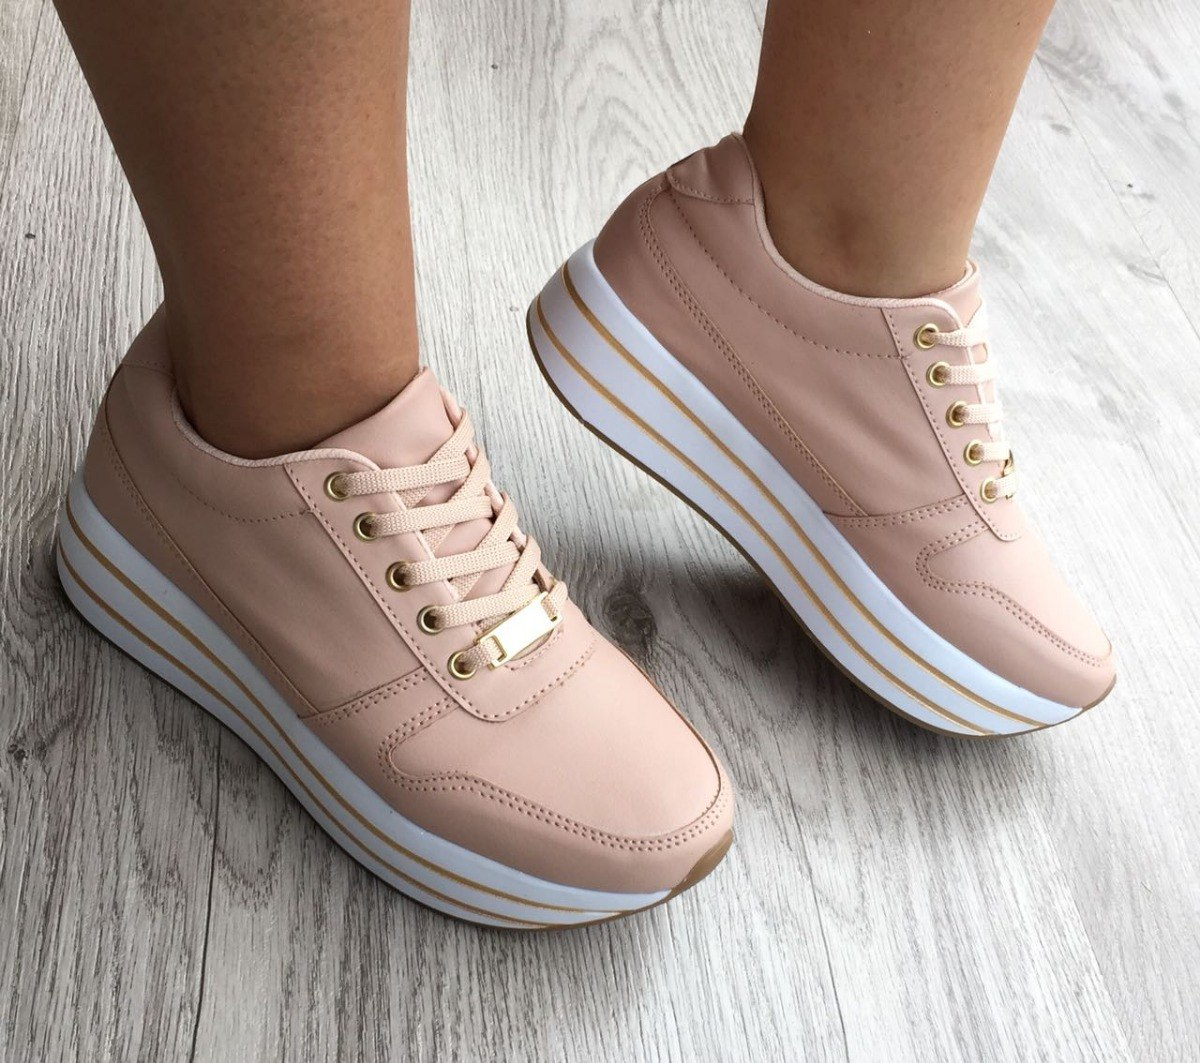 Para Femenina Calzado Moda Rosado Tenis La A Zapatos Mujer XOk80wNPn